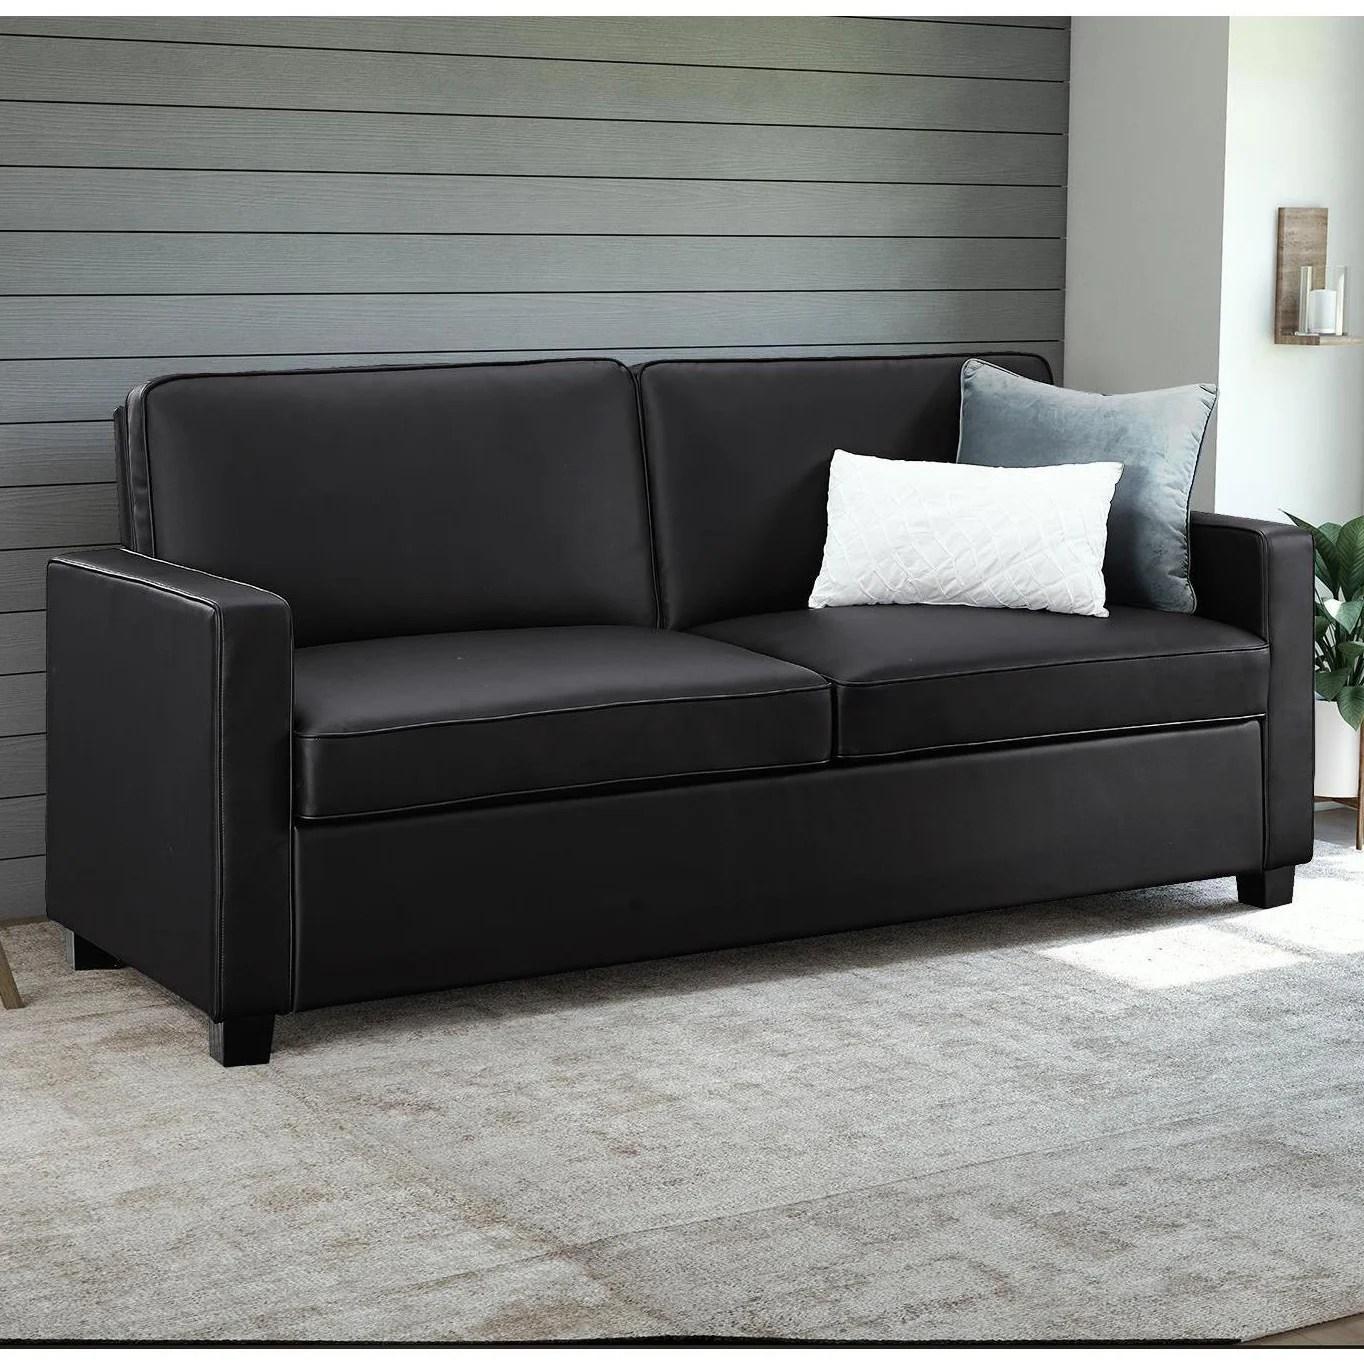 Porch Den Broward Black Faux Leather Queen Sleeper Sofa